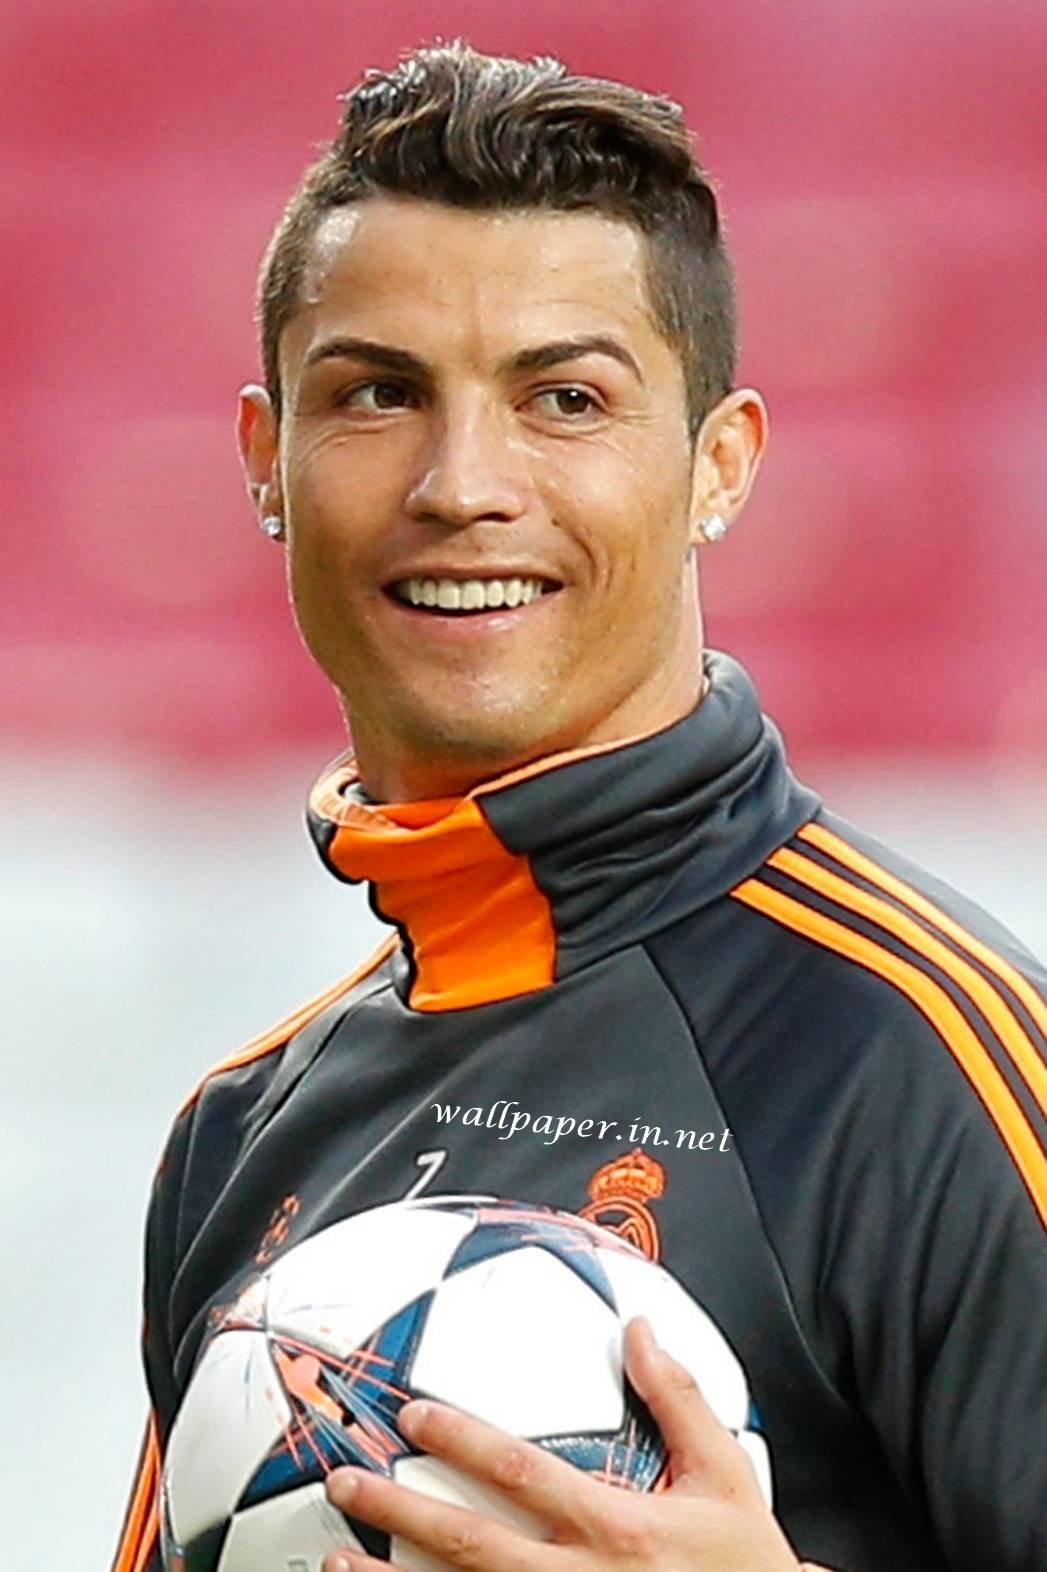 Cristiano Ronaldo Haircut 2010 World Cup Haircuts Models I Card